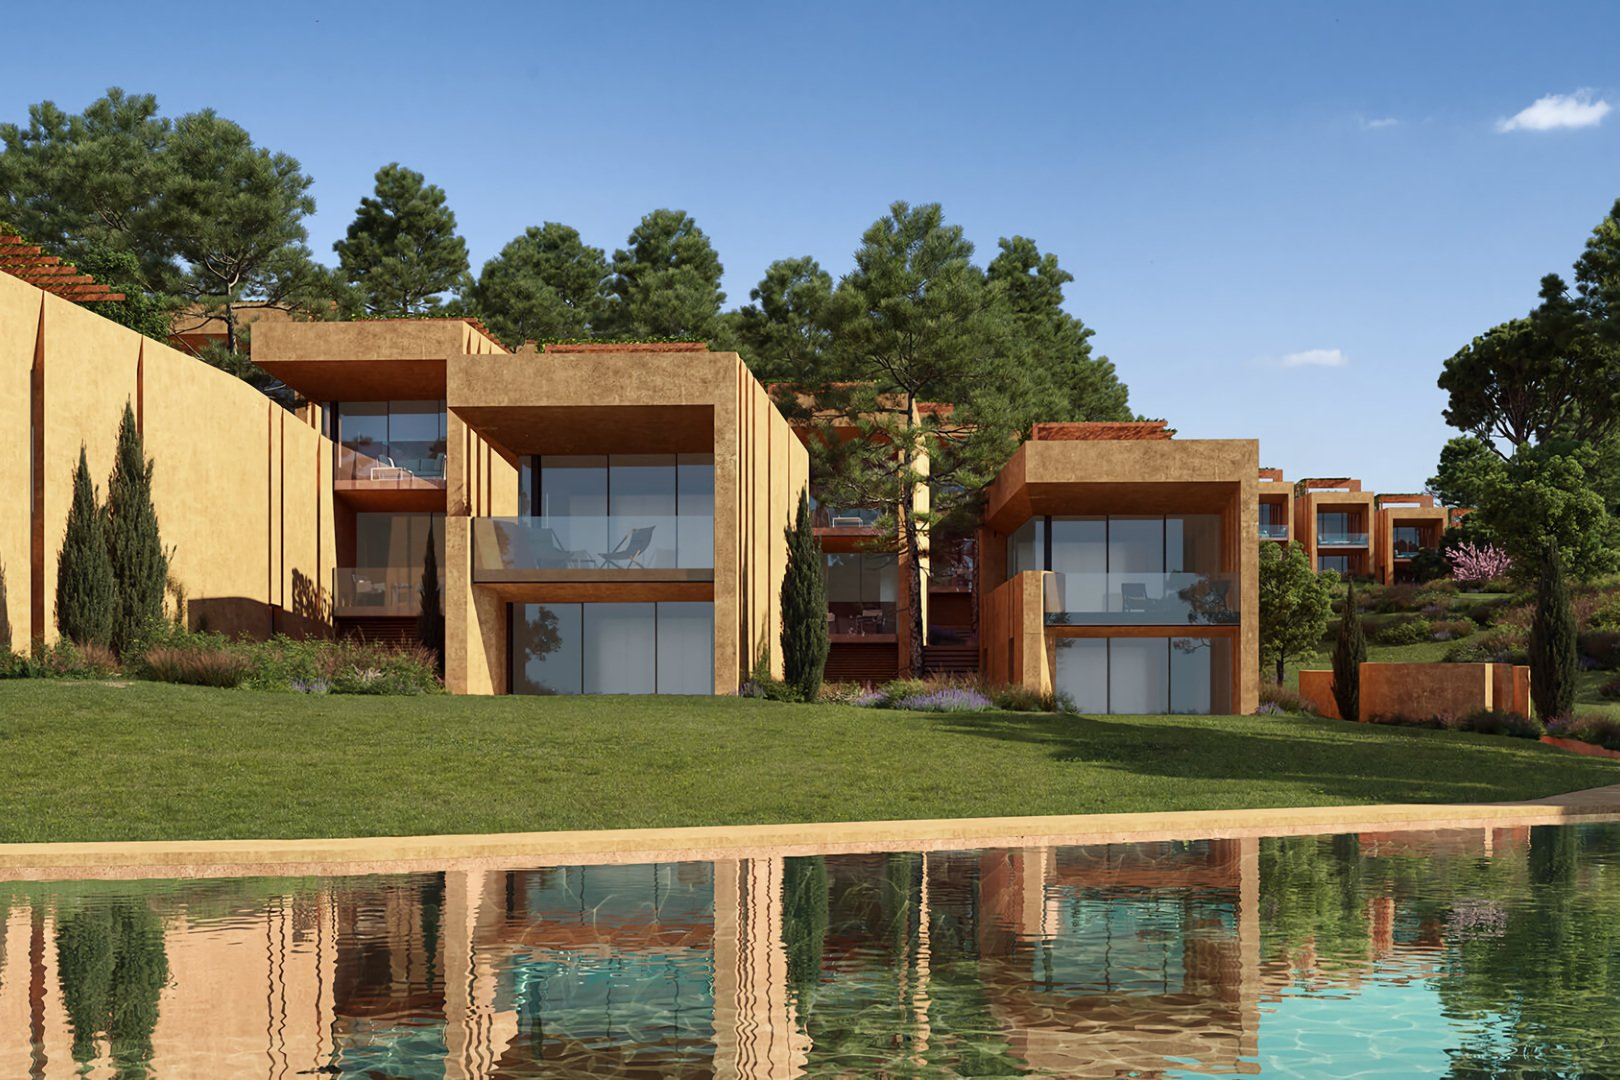 2 Bedroom Apartment Lagos, Western Algarve Ref: GA378B